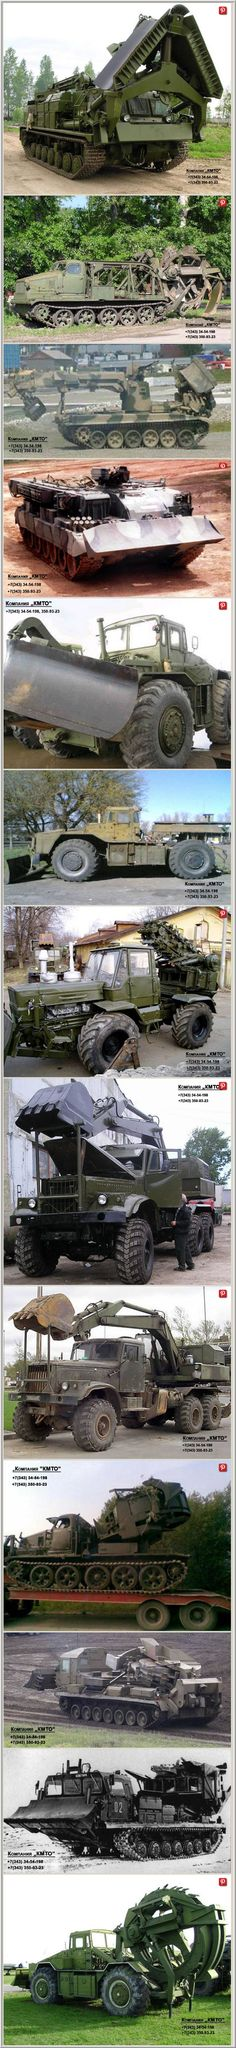 Russian military hardware